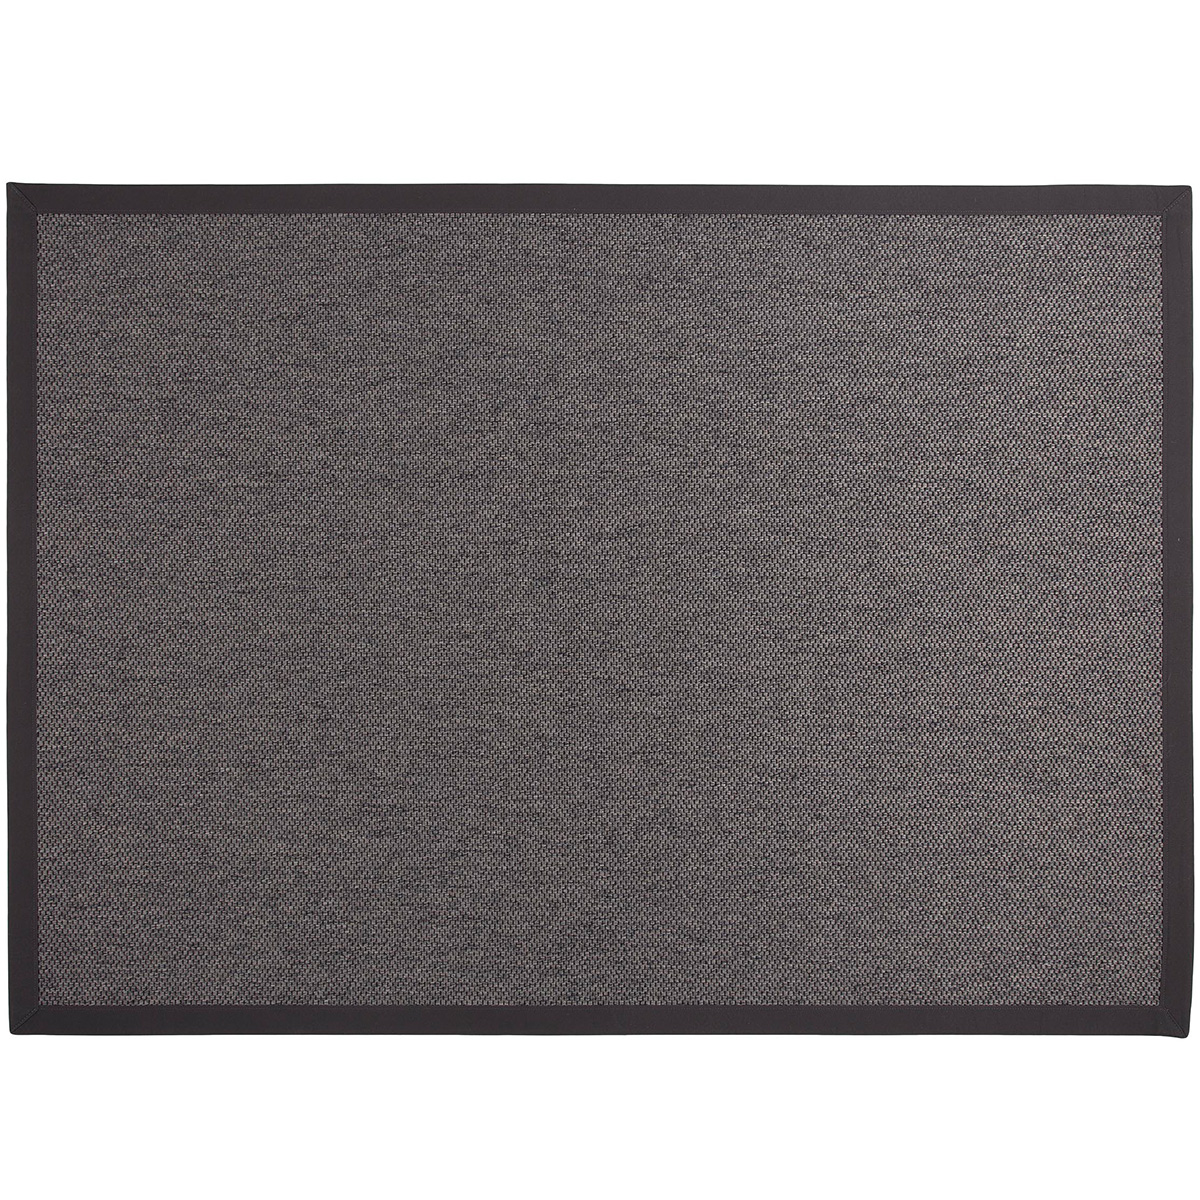 Vloerkleed Brinker Dynamo Grey | 165 x 230 cm